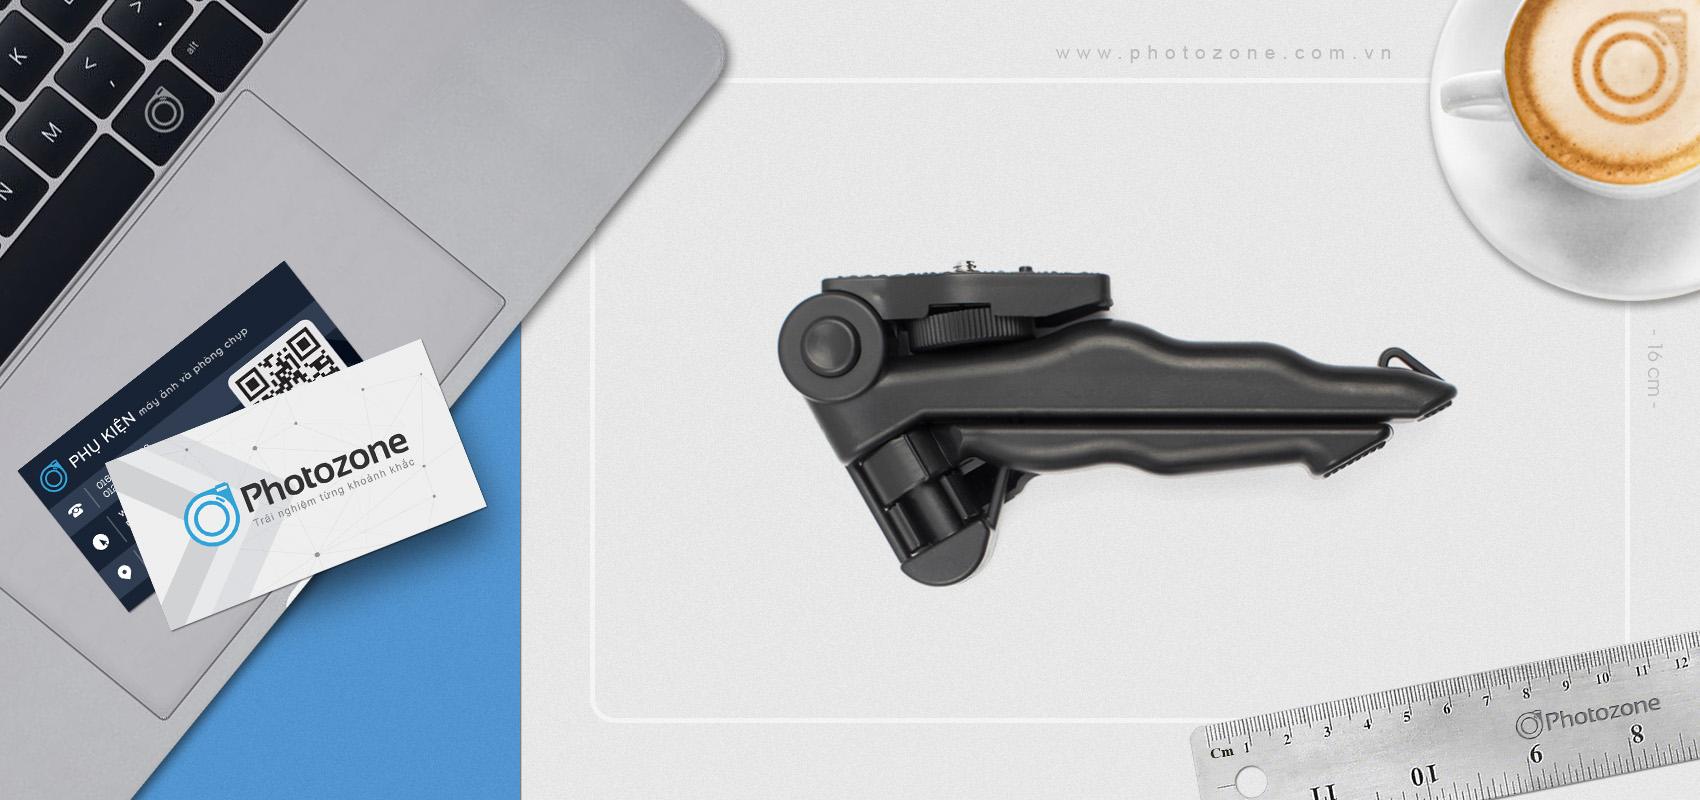 Tripod mini + Grip cầm tay cho GoPro HERO, Compact